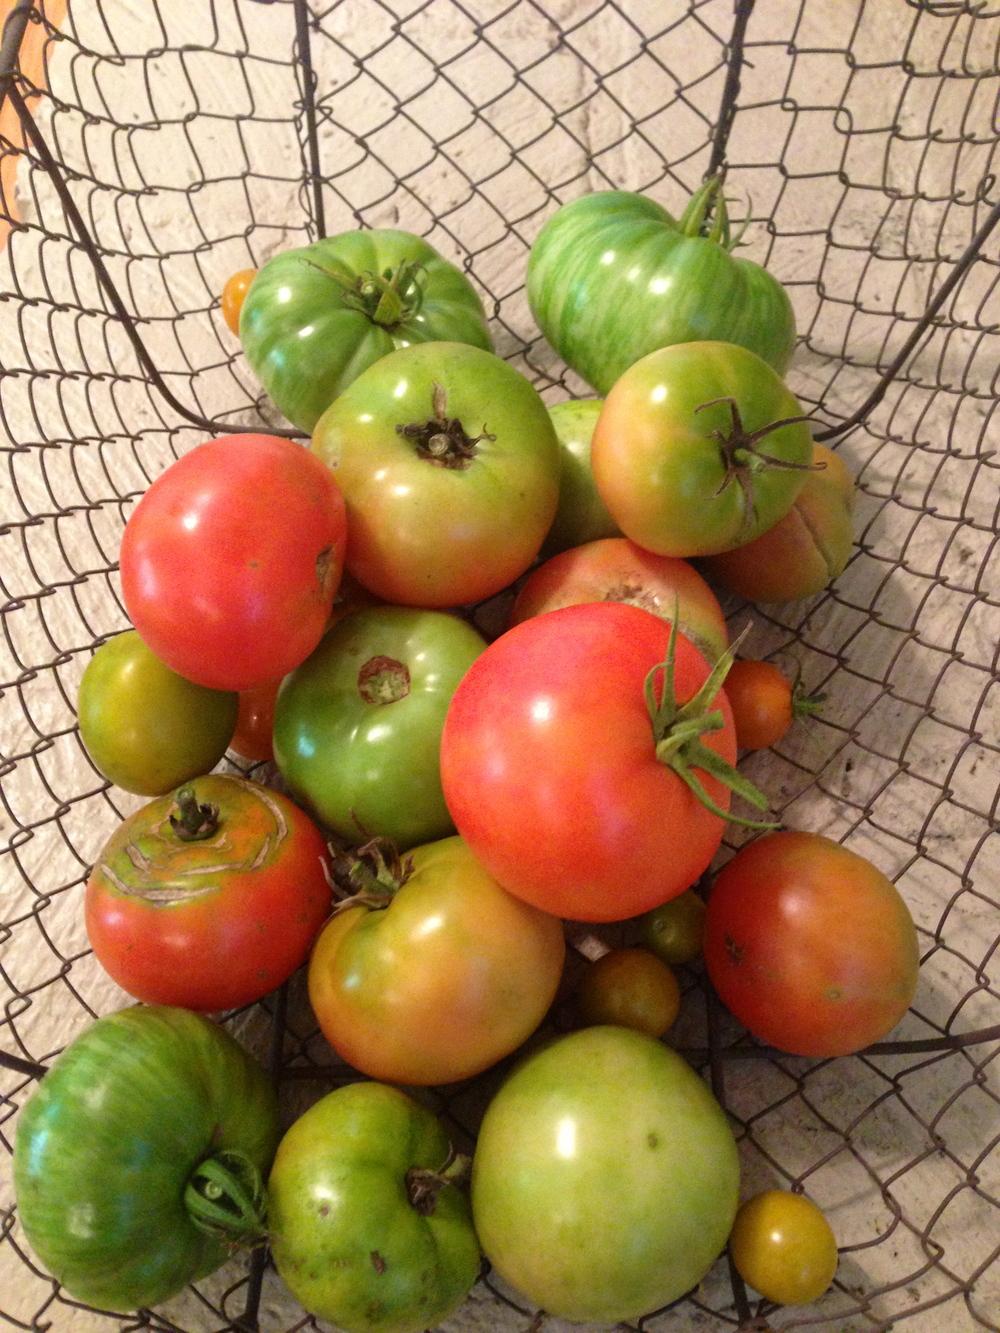 yay tomatoes!